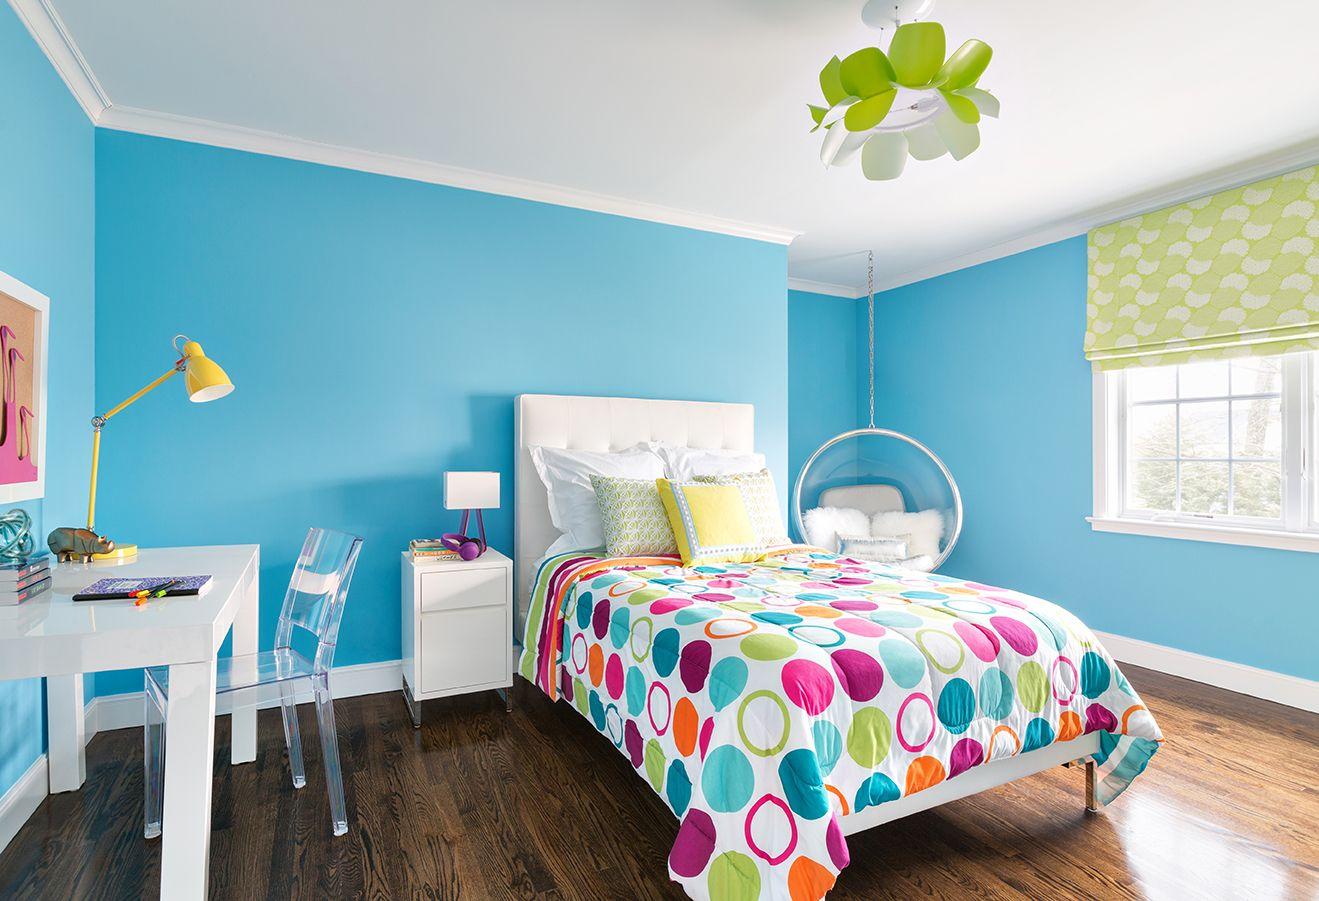 Desain Inspirasi Cat Kamar Tidur Warna Biru